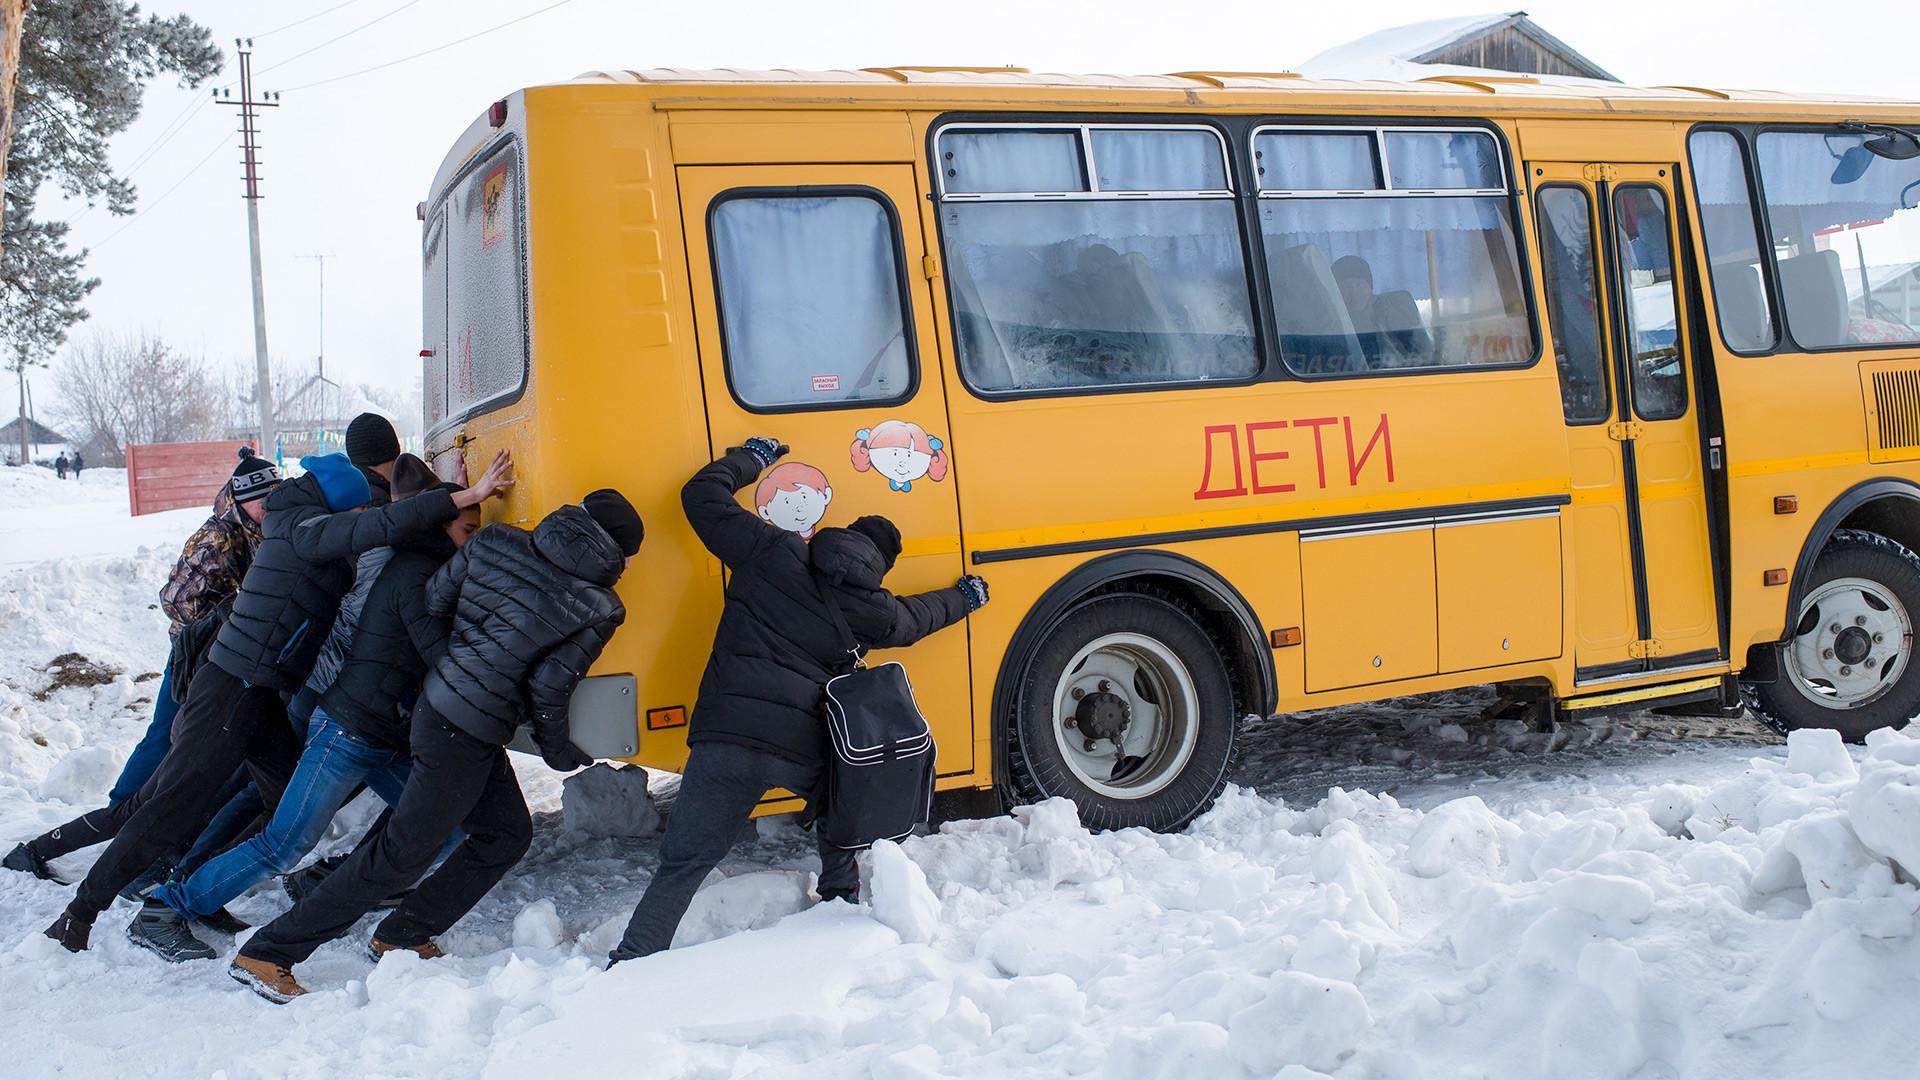 Omsk Region, Siberia.